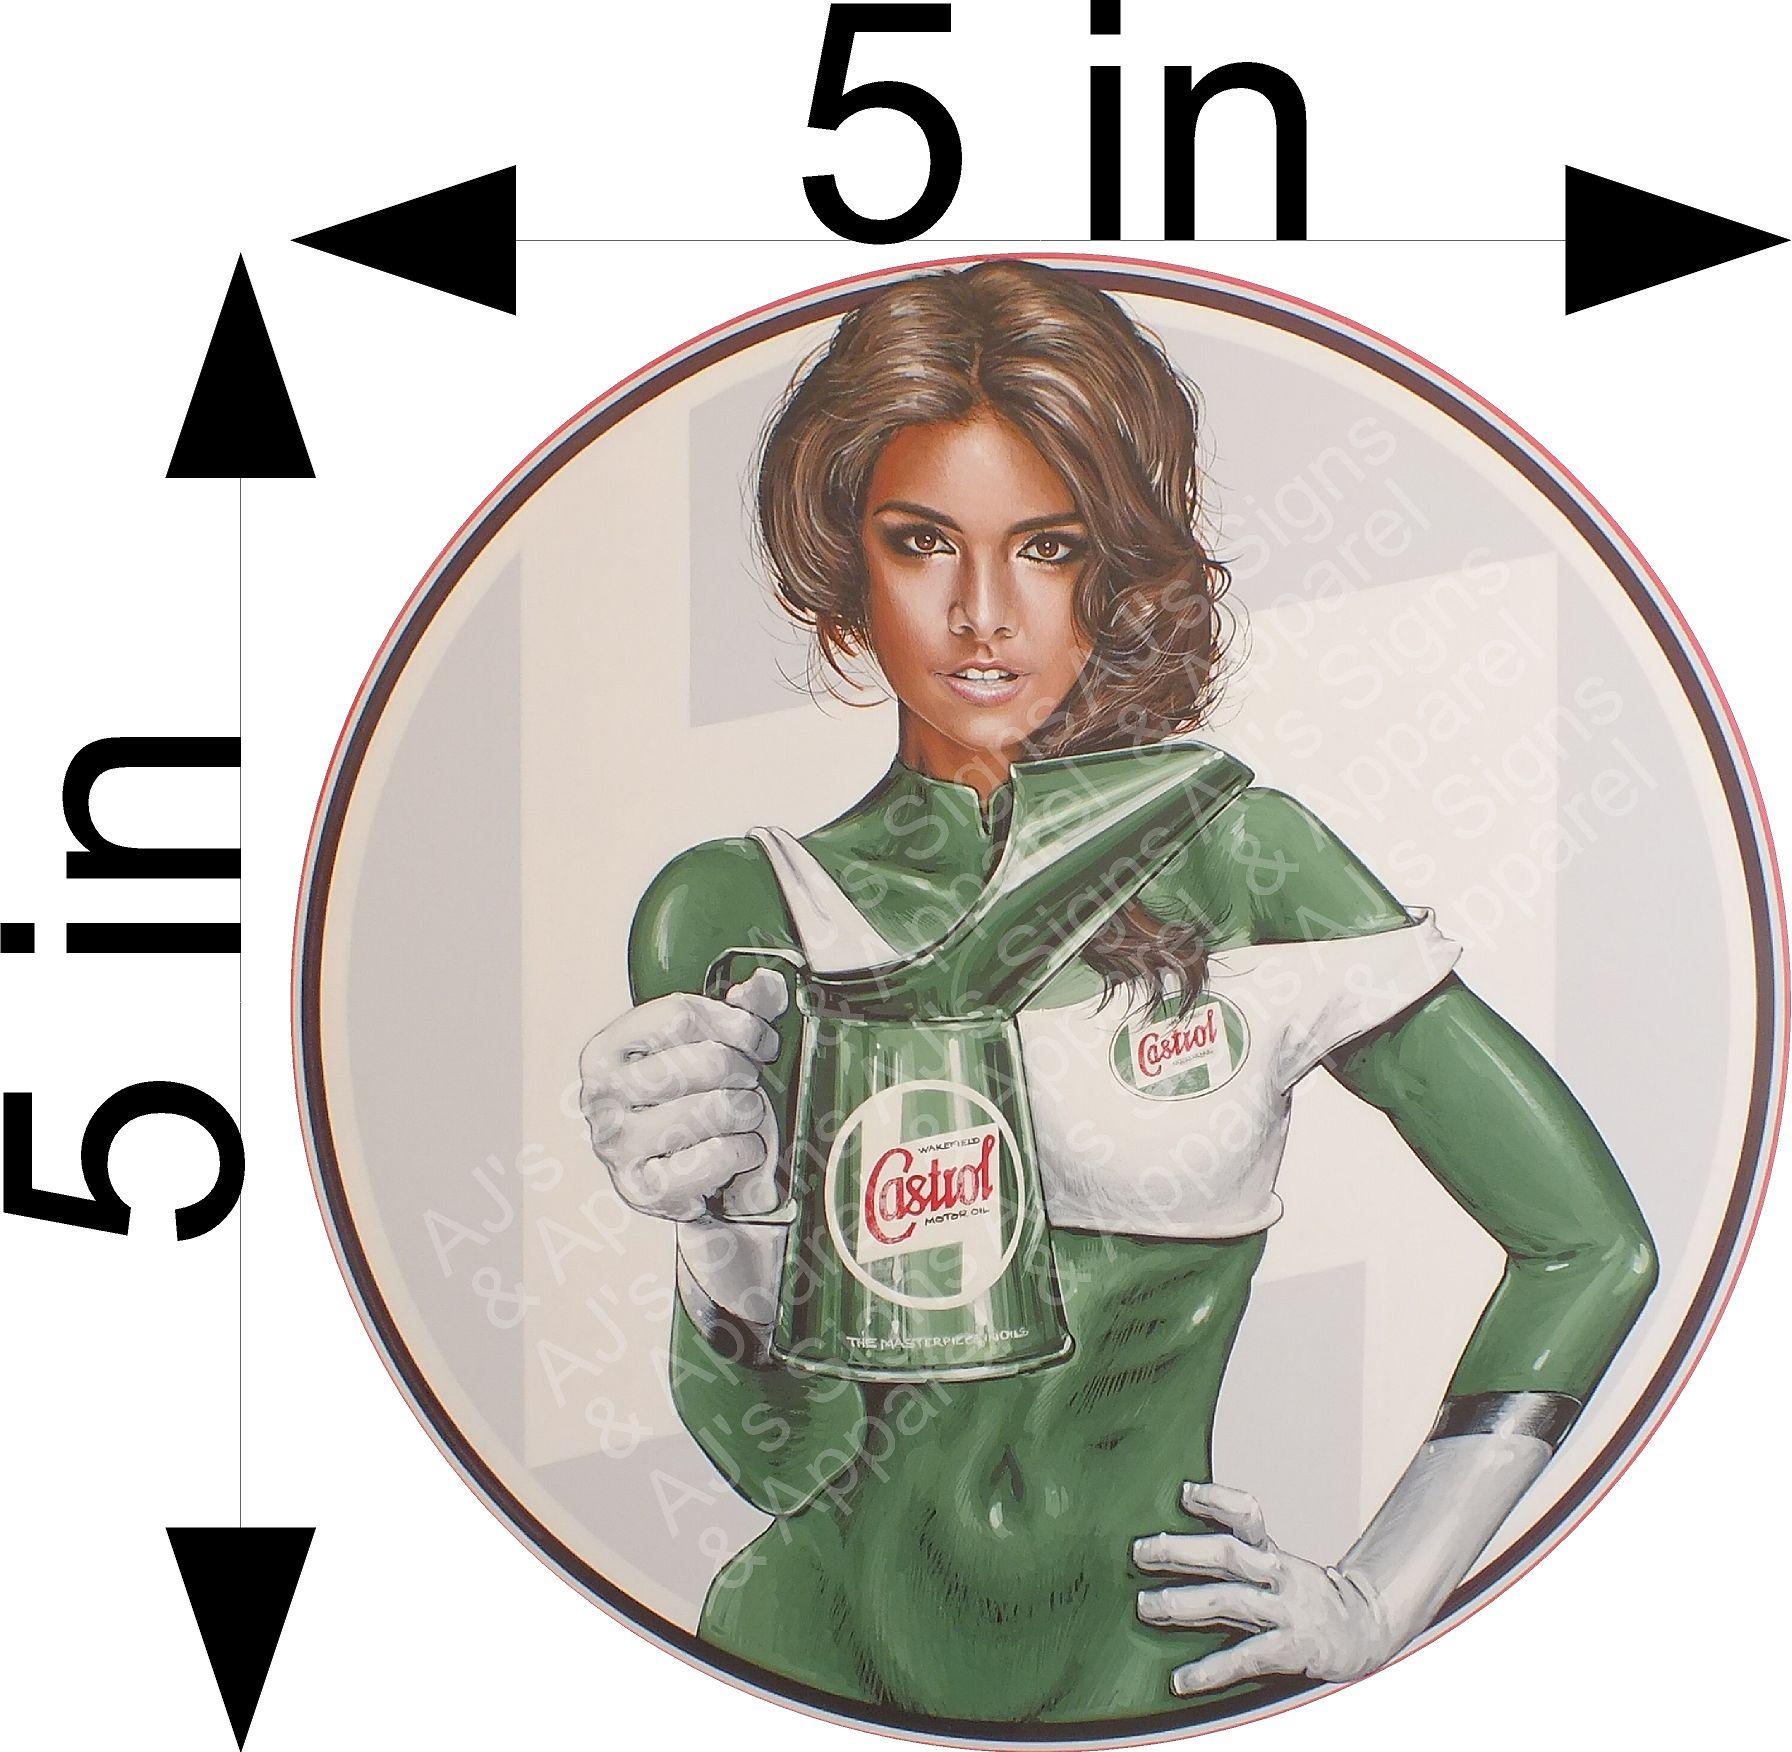 Castrol Pin up Girl Sticker